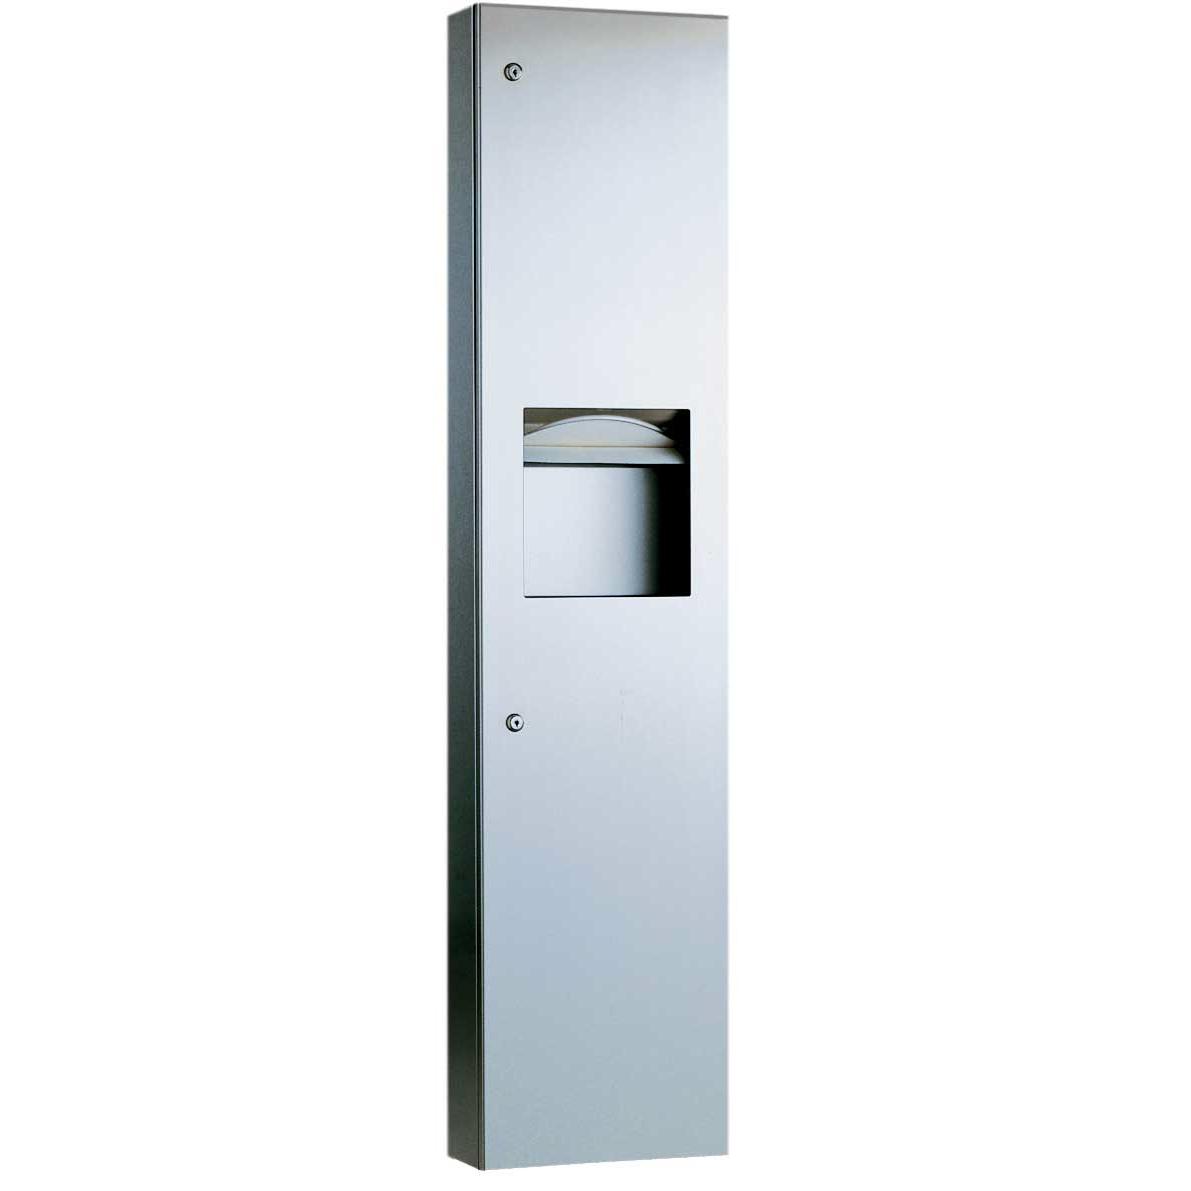 38032 Semi-Recessed Paper Towel Dispenser & Waste Receptacle